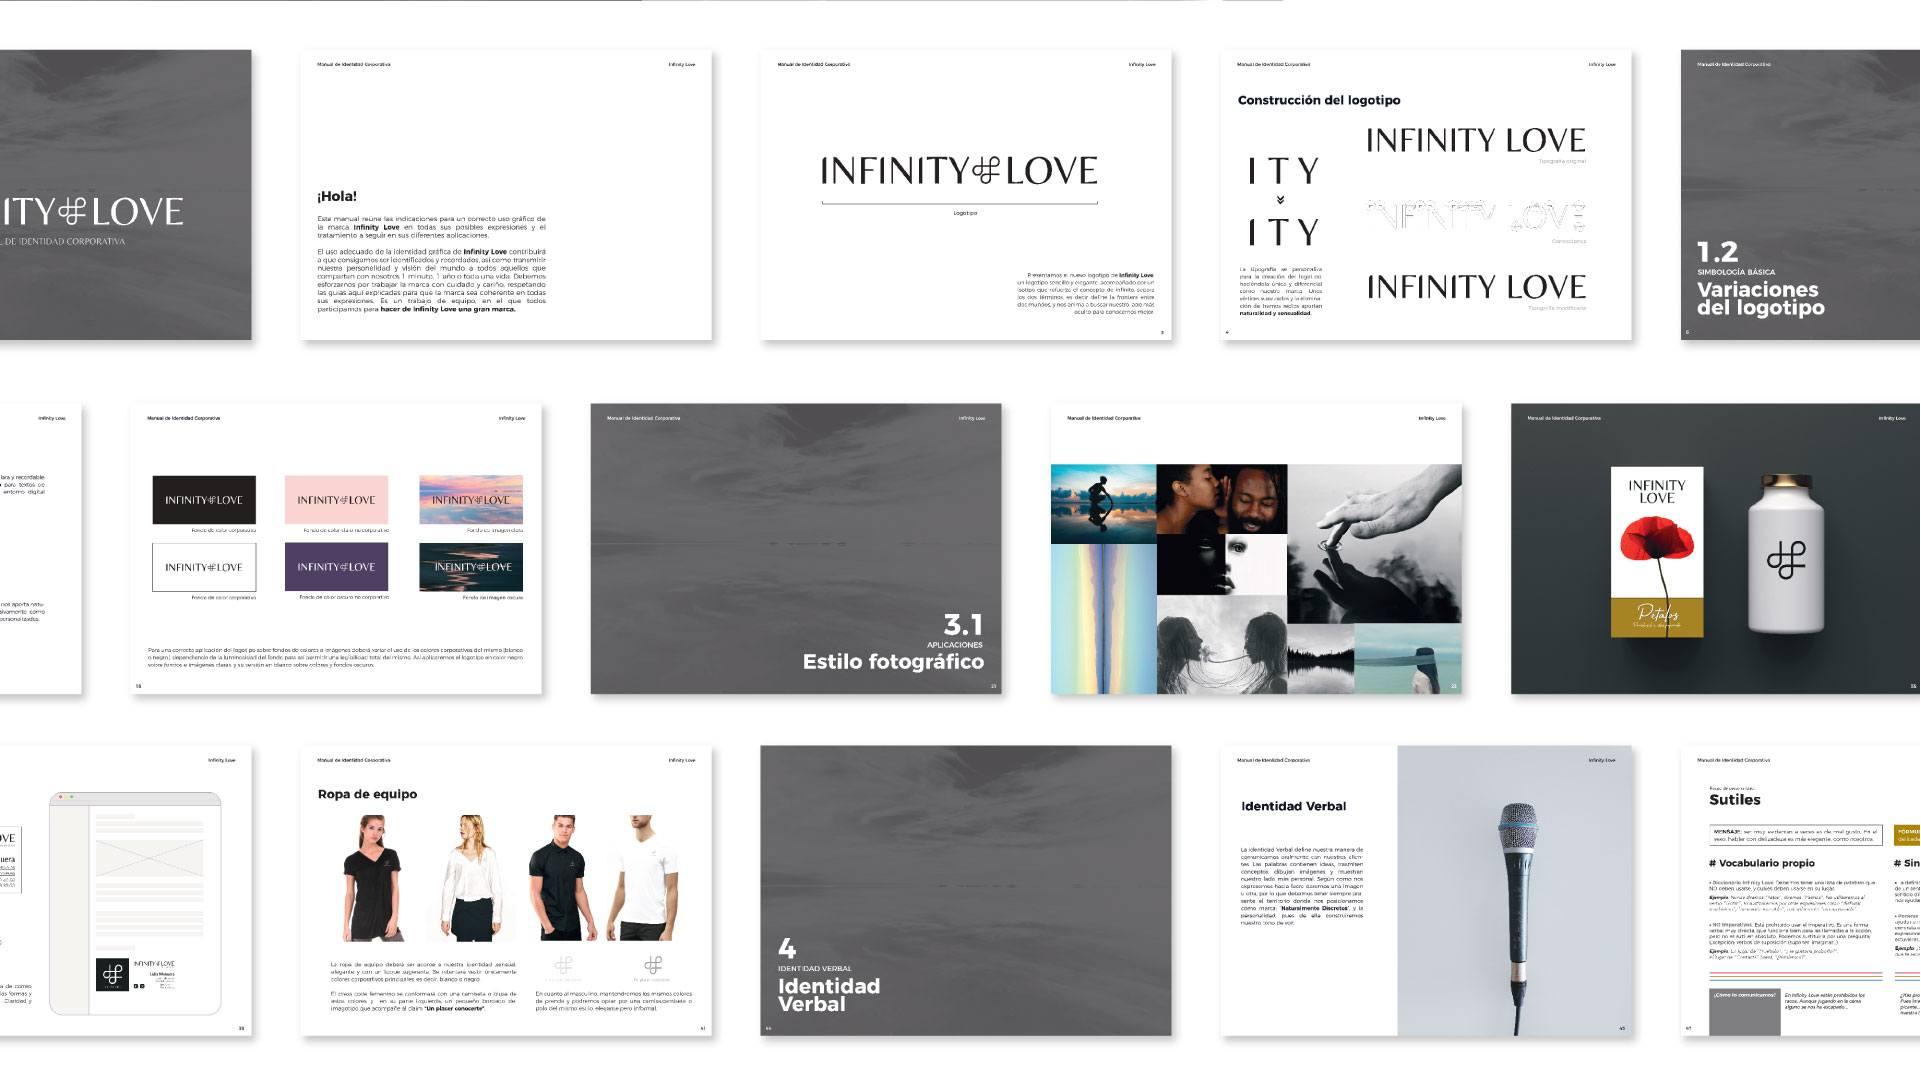 Identidad visual corporativa, Identidad corporativa, Branding Alicante, Arquitectura e interiorismo Alicante, Estudio interiorismo Alicante, Estrategia de negocio